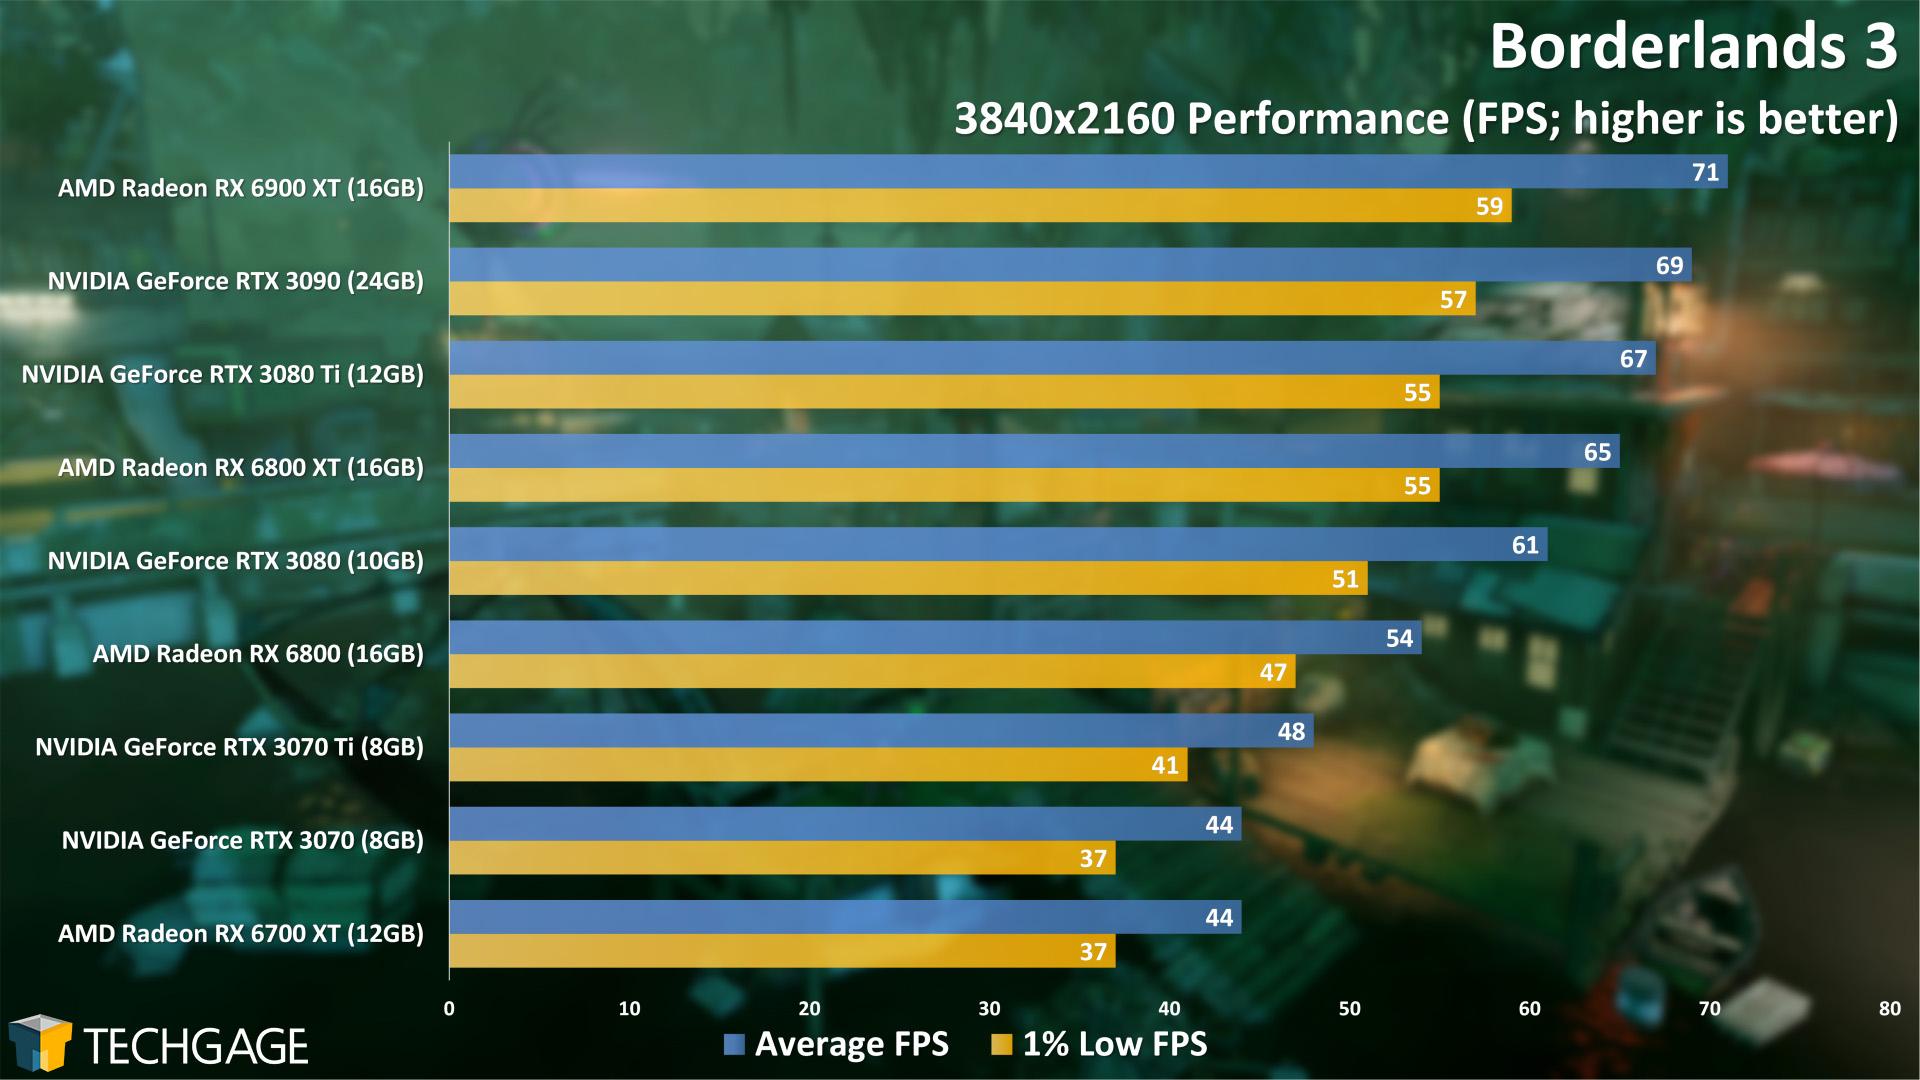 Borderlands 3 - 2160p Performance (NVIDIA GeForce RTX 3070 Ti)